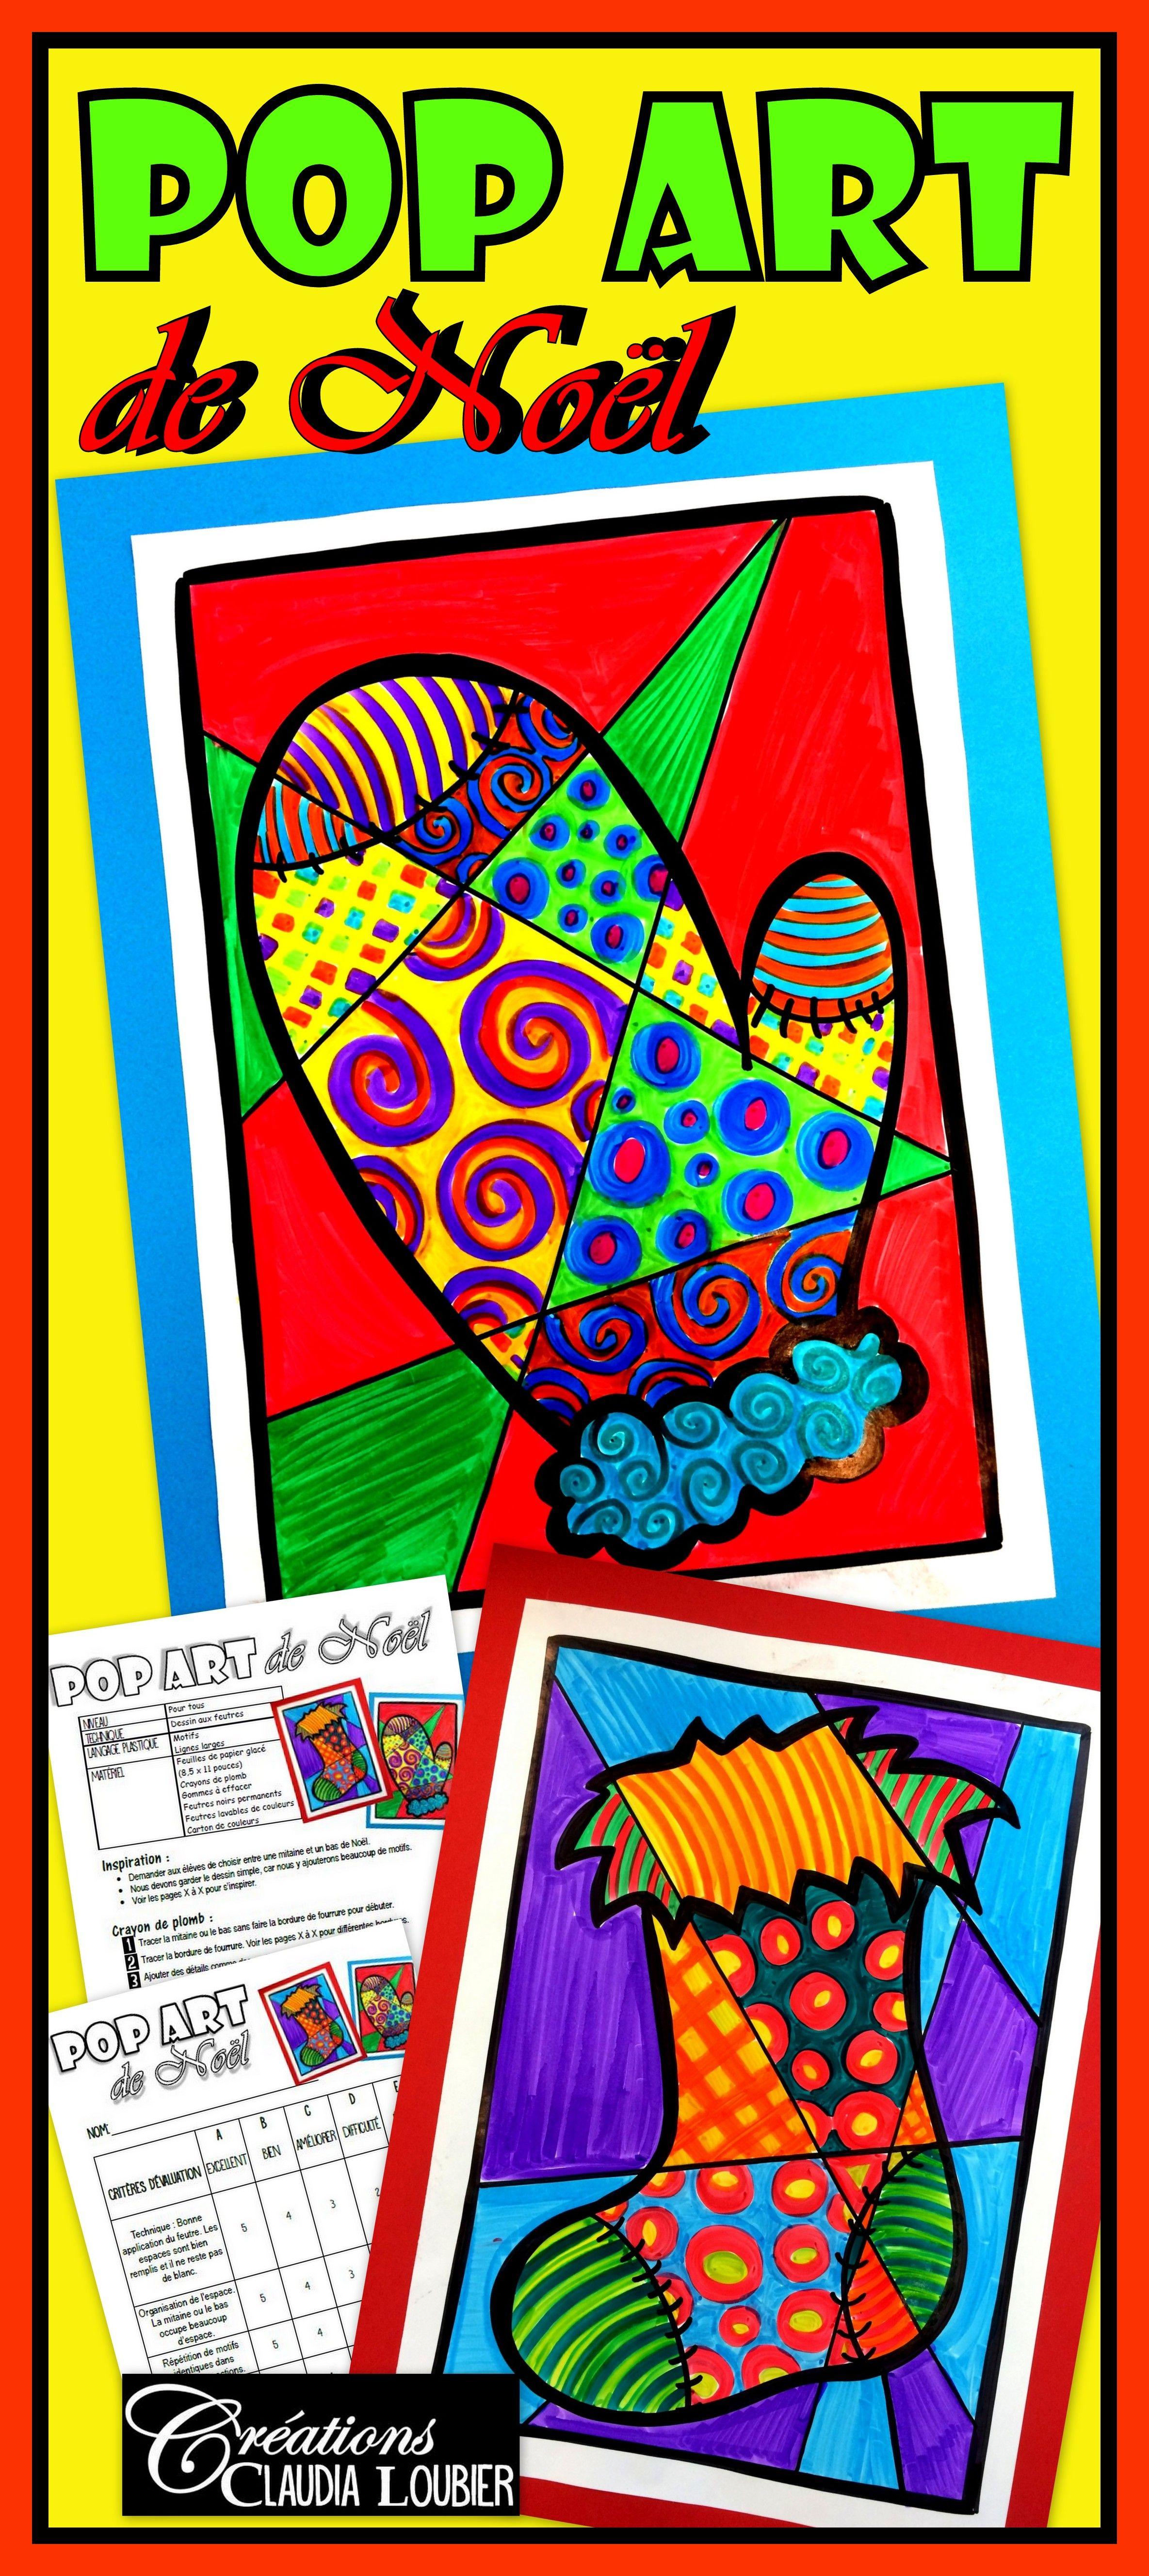 Pop art de Noël : Arts plastiques | Art de noël, Art plastique et Projets artistiques